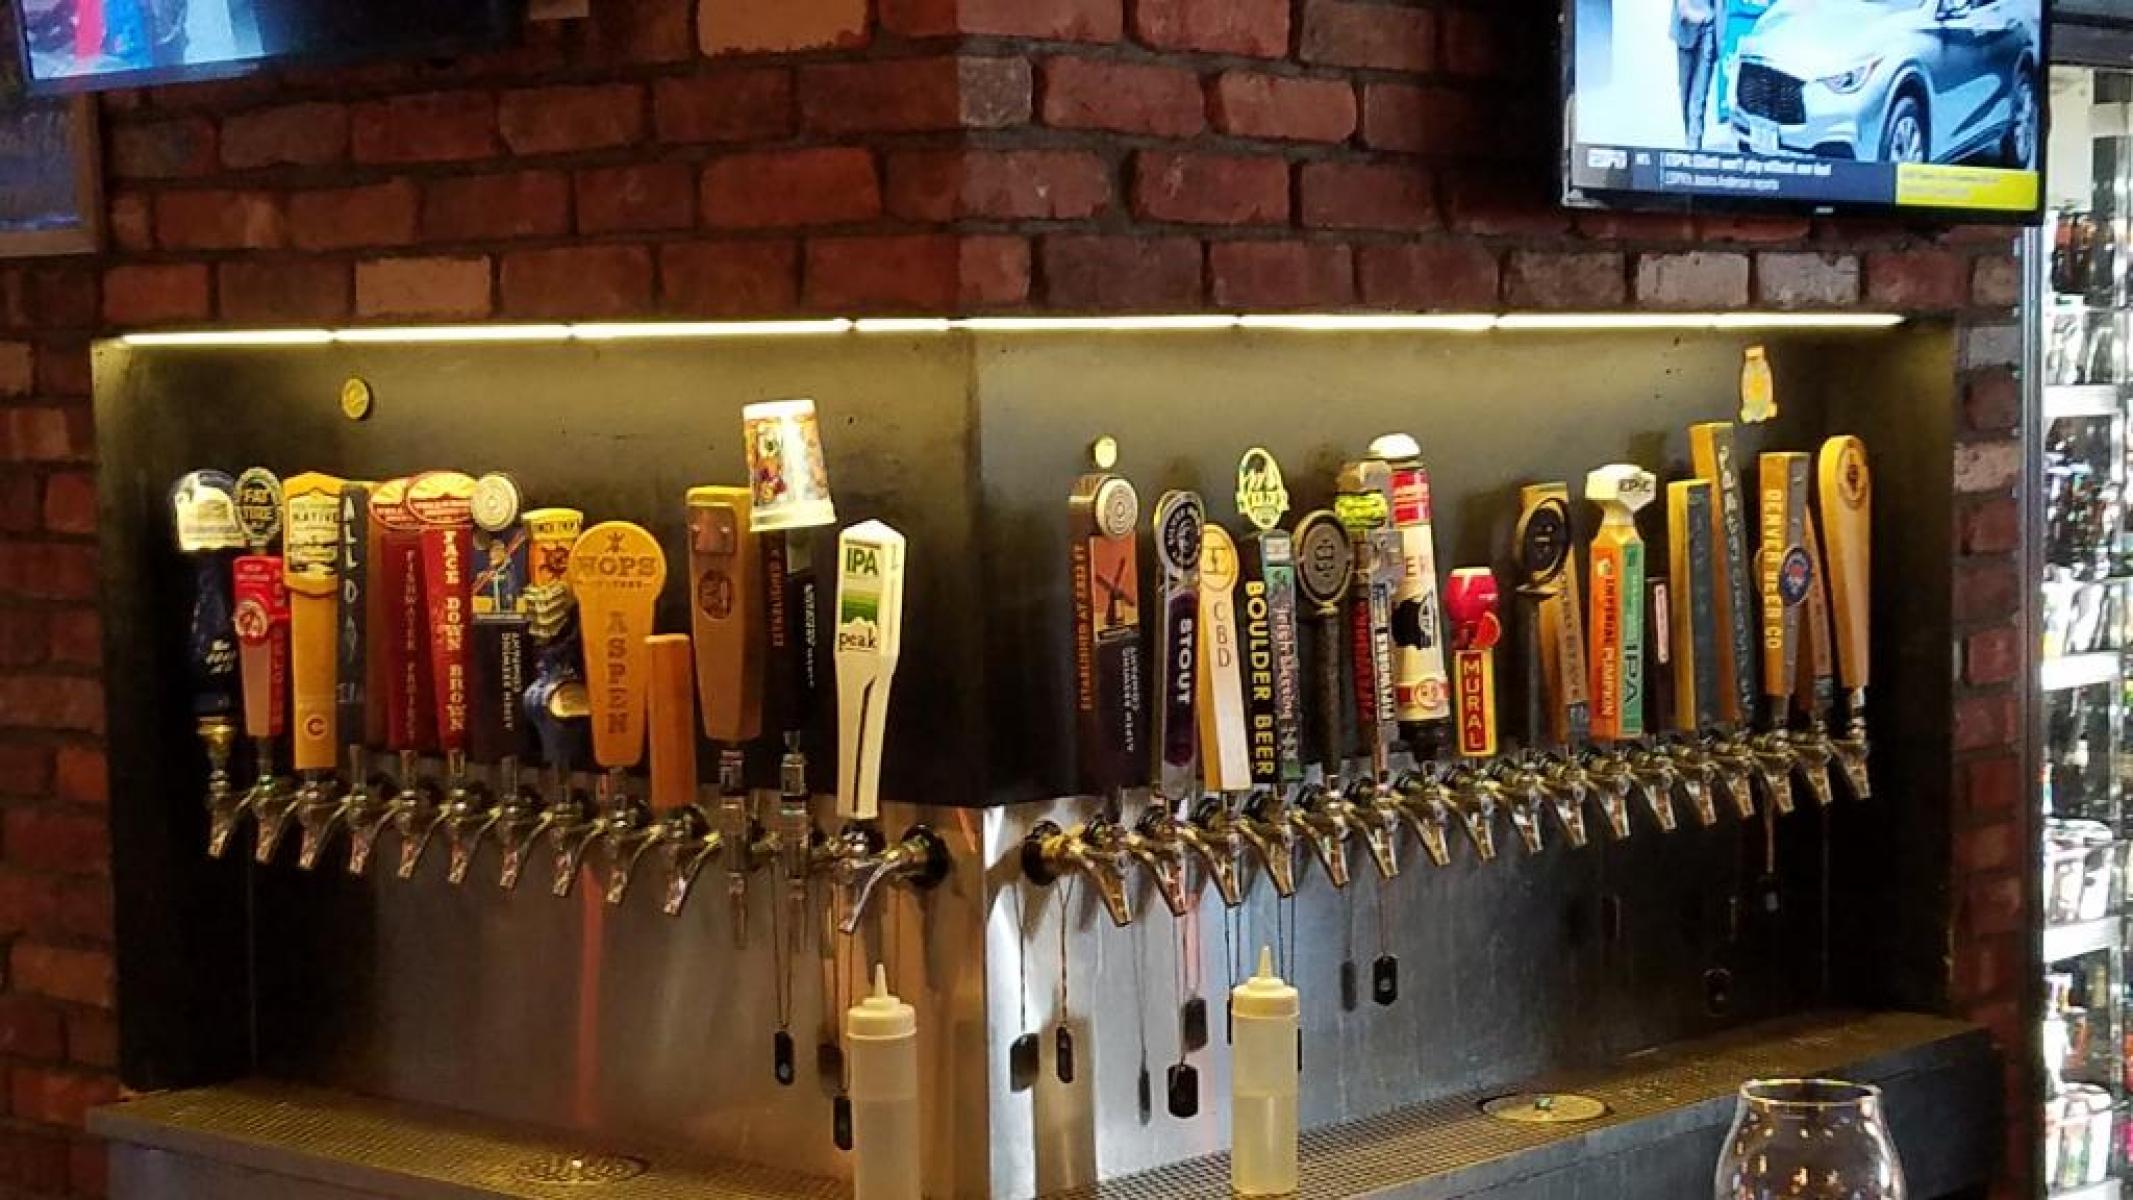 Tap behind bar